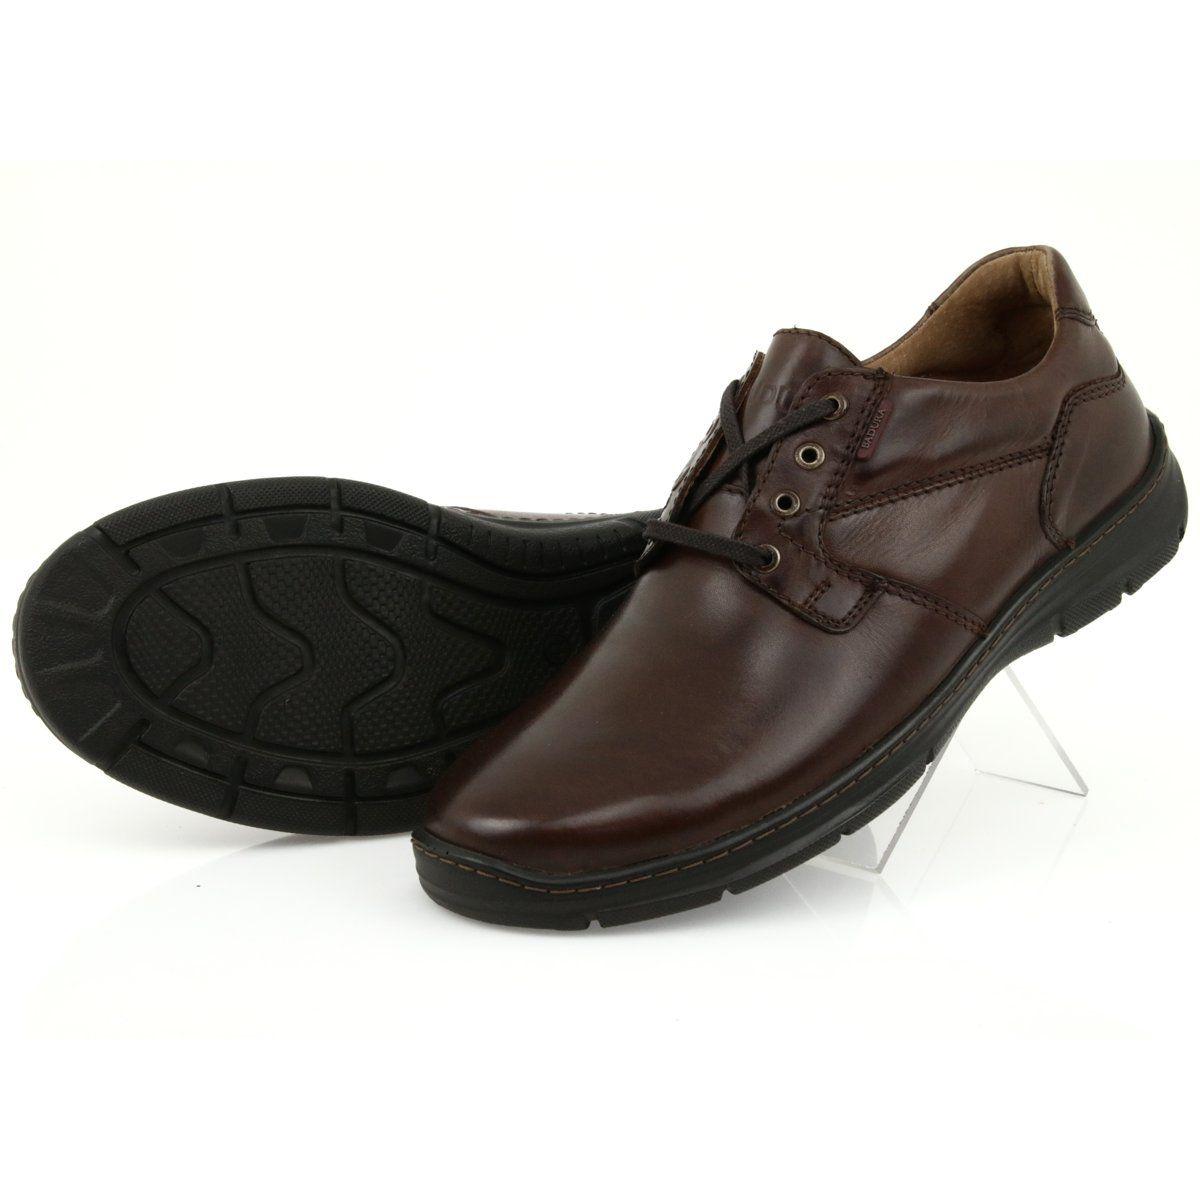 Czarne Polbuty Na Koturnie 7 9021 Brazowe Dress Shoes Men Loafers Men Dress Shoes